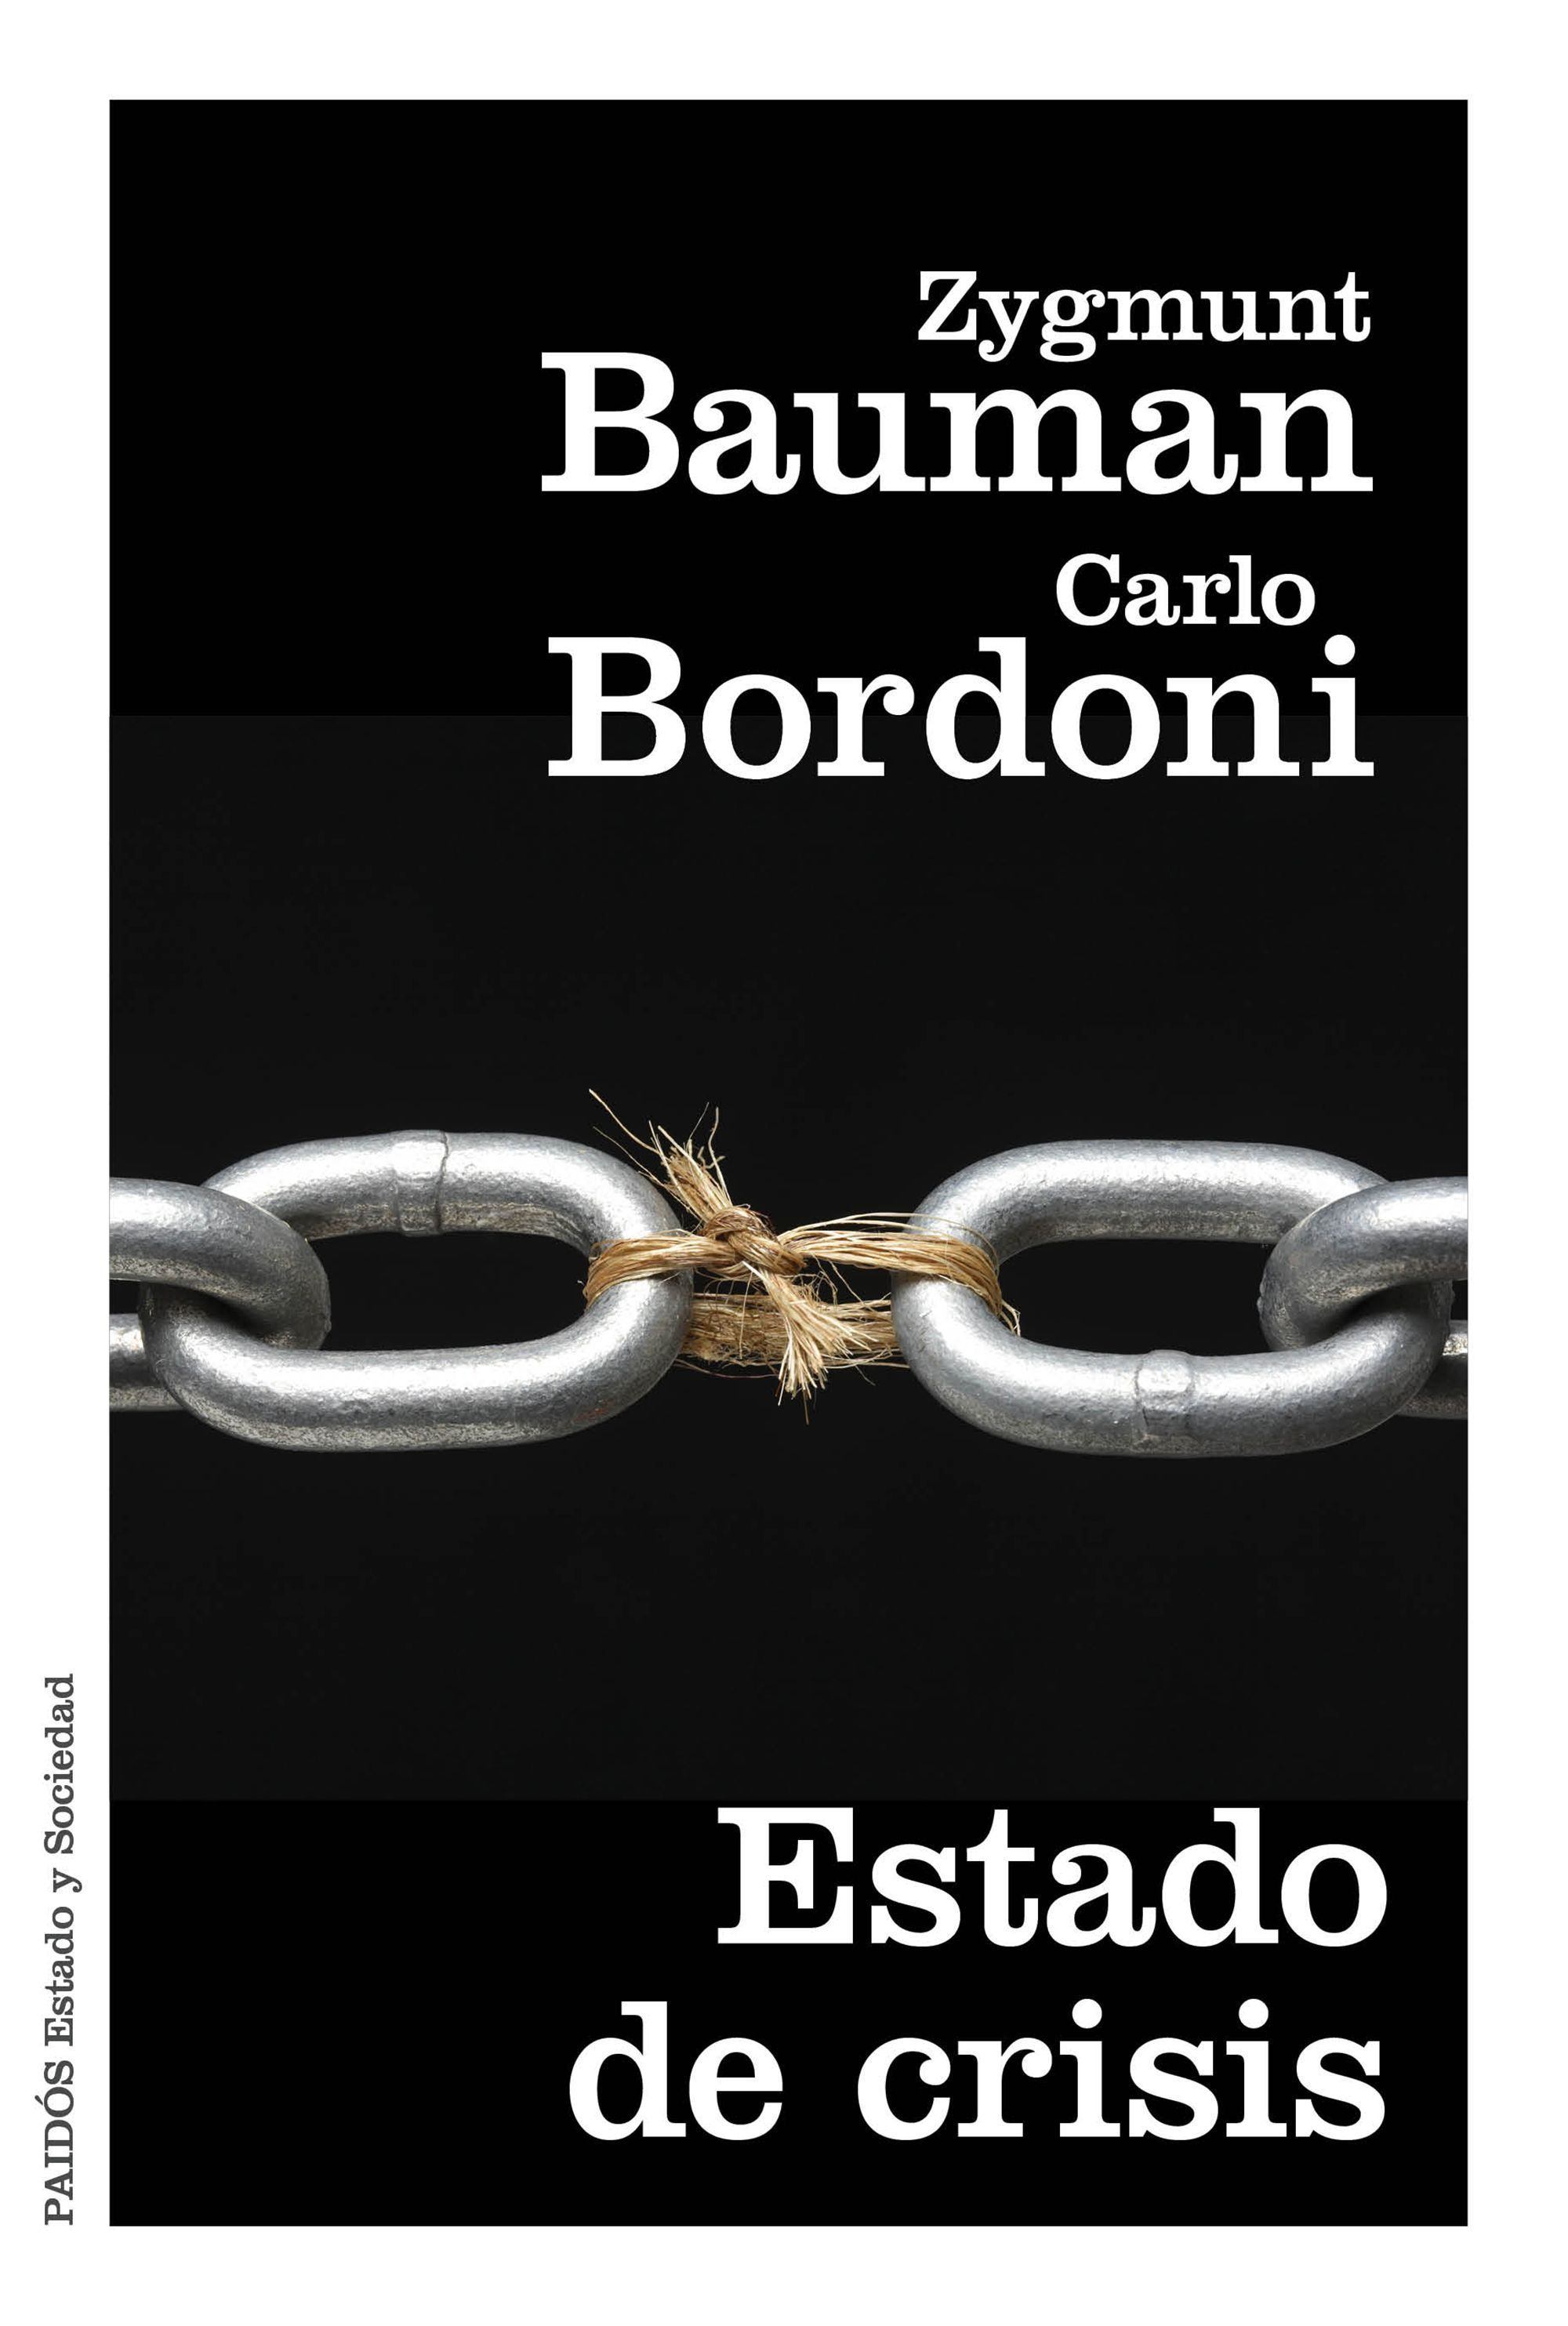 Estado de crisis / Zygmunt Bauman, Carlo Bordoni ; traducción de Albino Santos Mosquera PublicaciónBarcelona : Paidós Ibérica, 2016